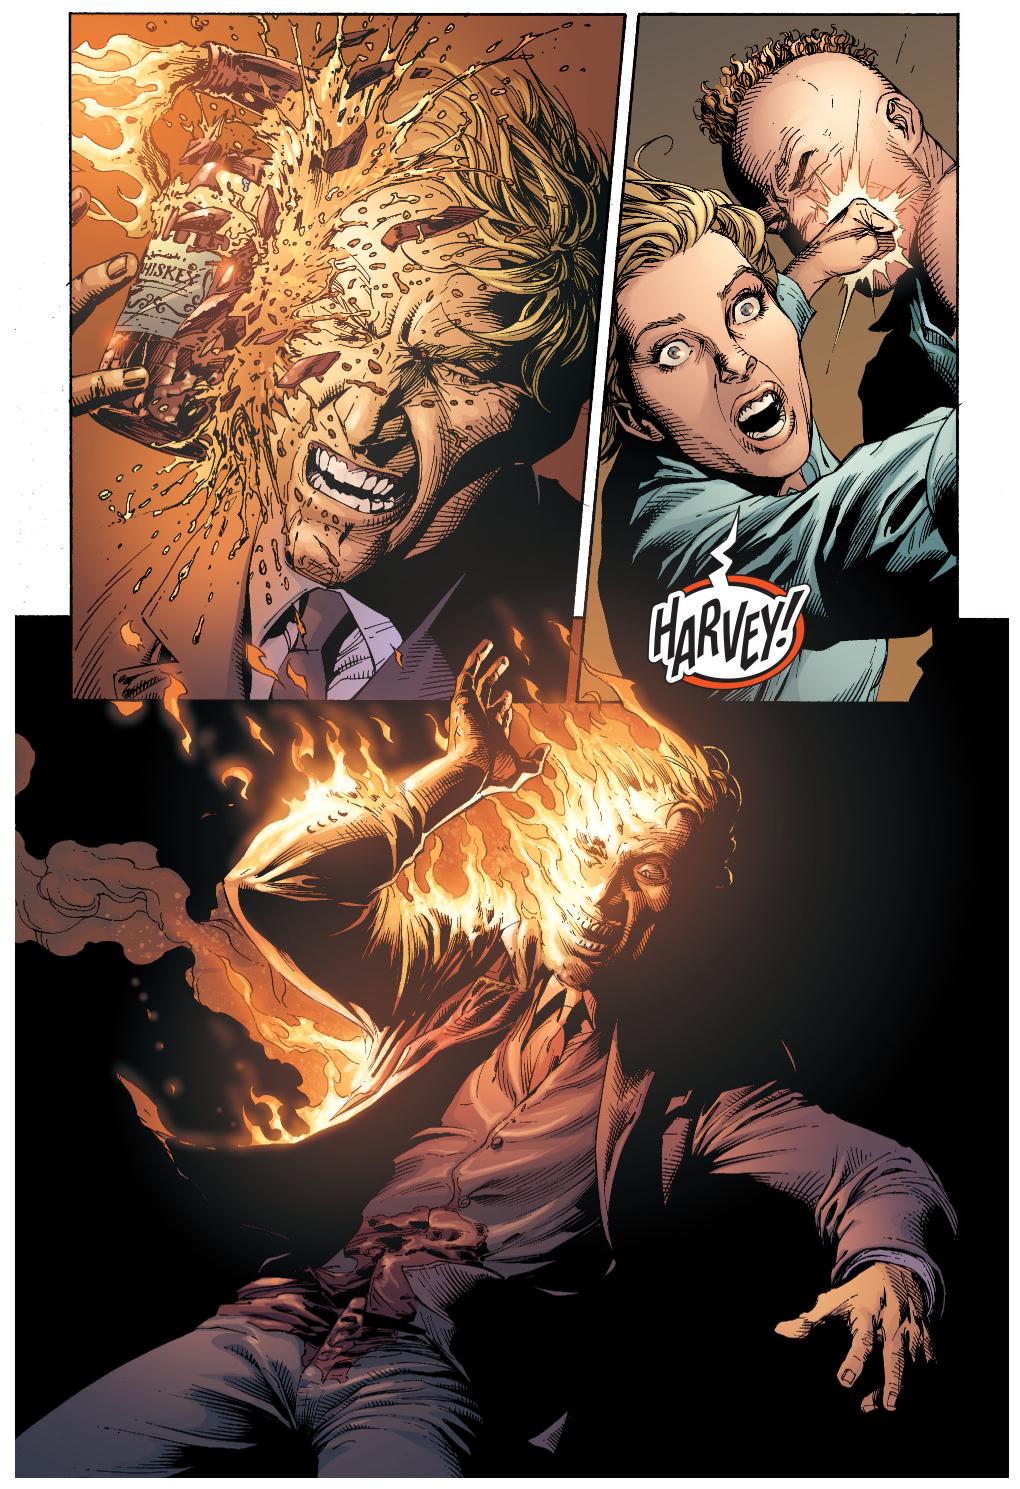 Harvey Dent New Earth: Harvey Dent's Face Is Burned Off (Earth 1)